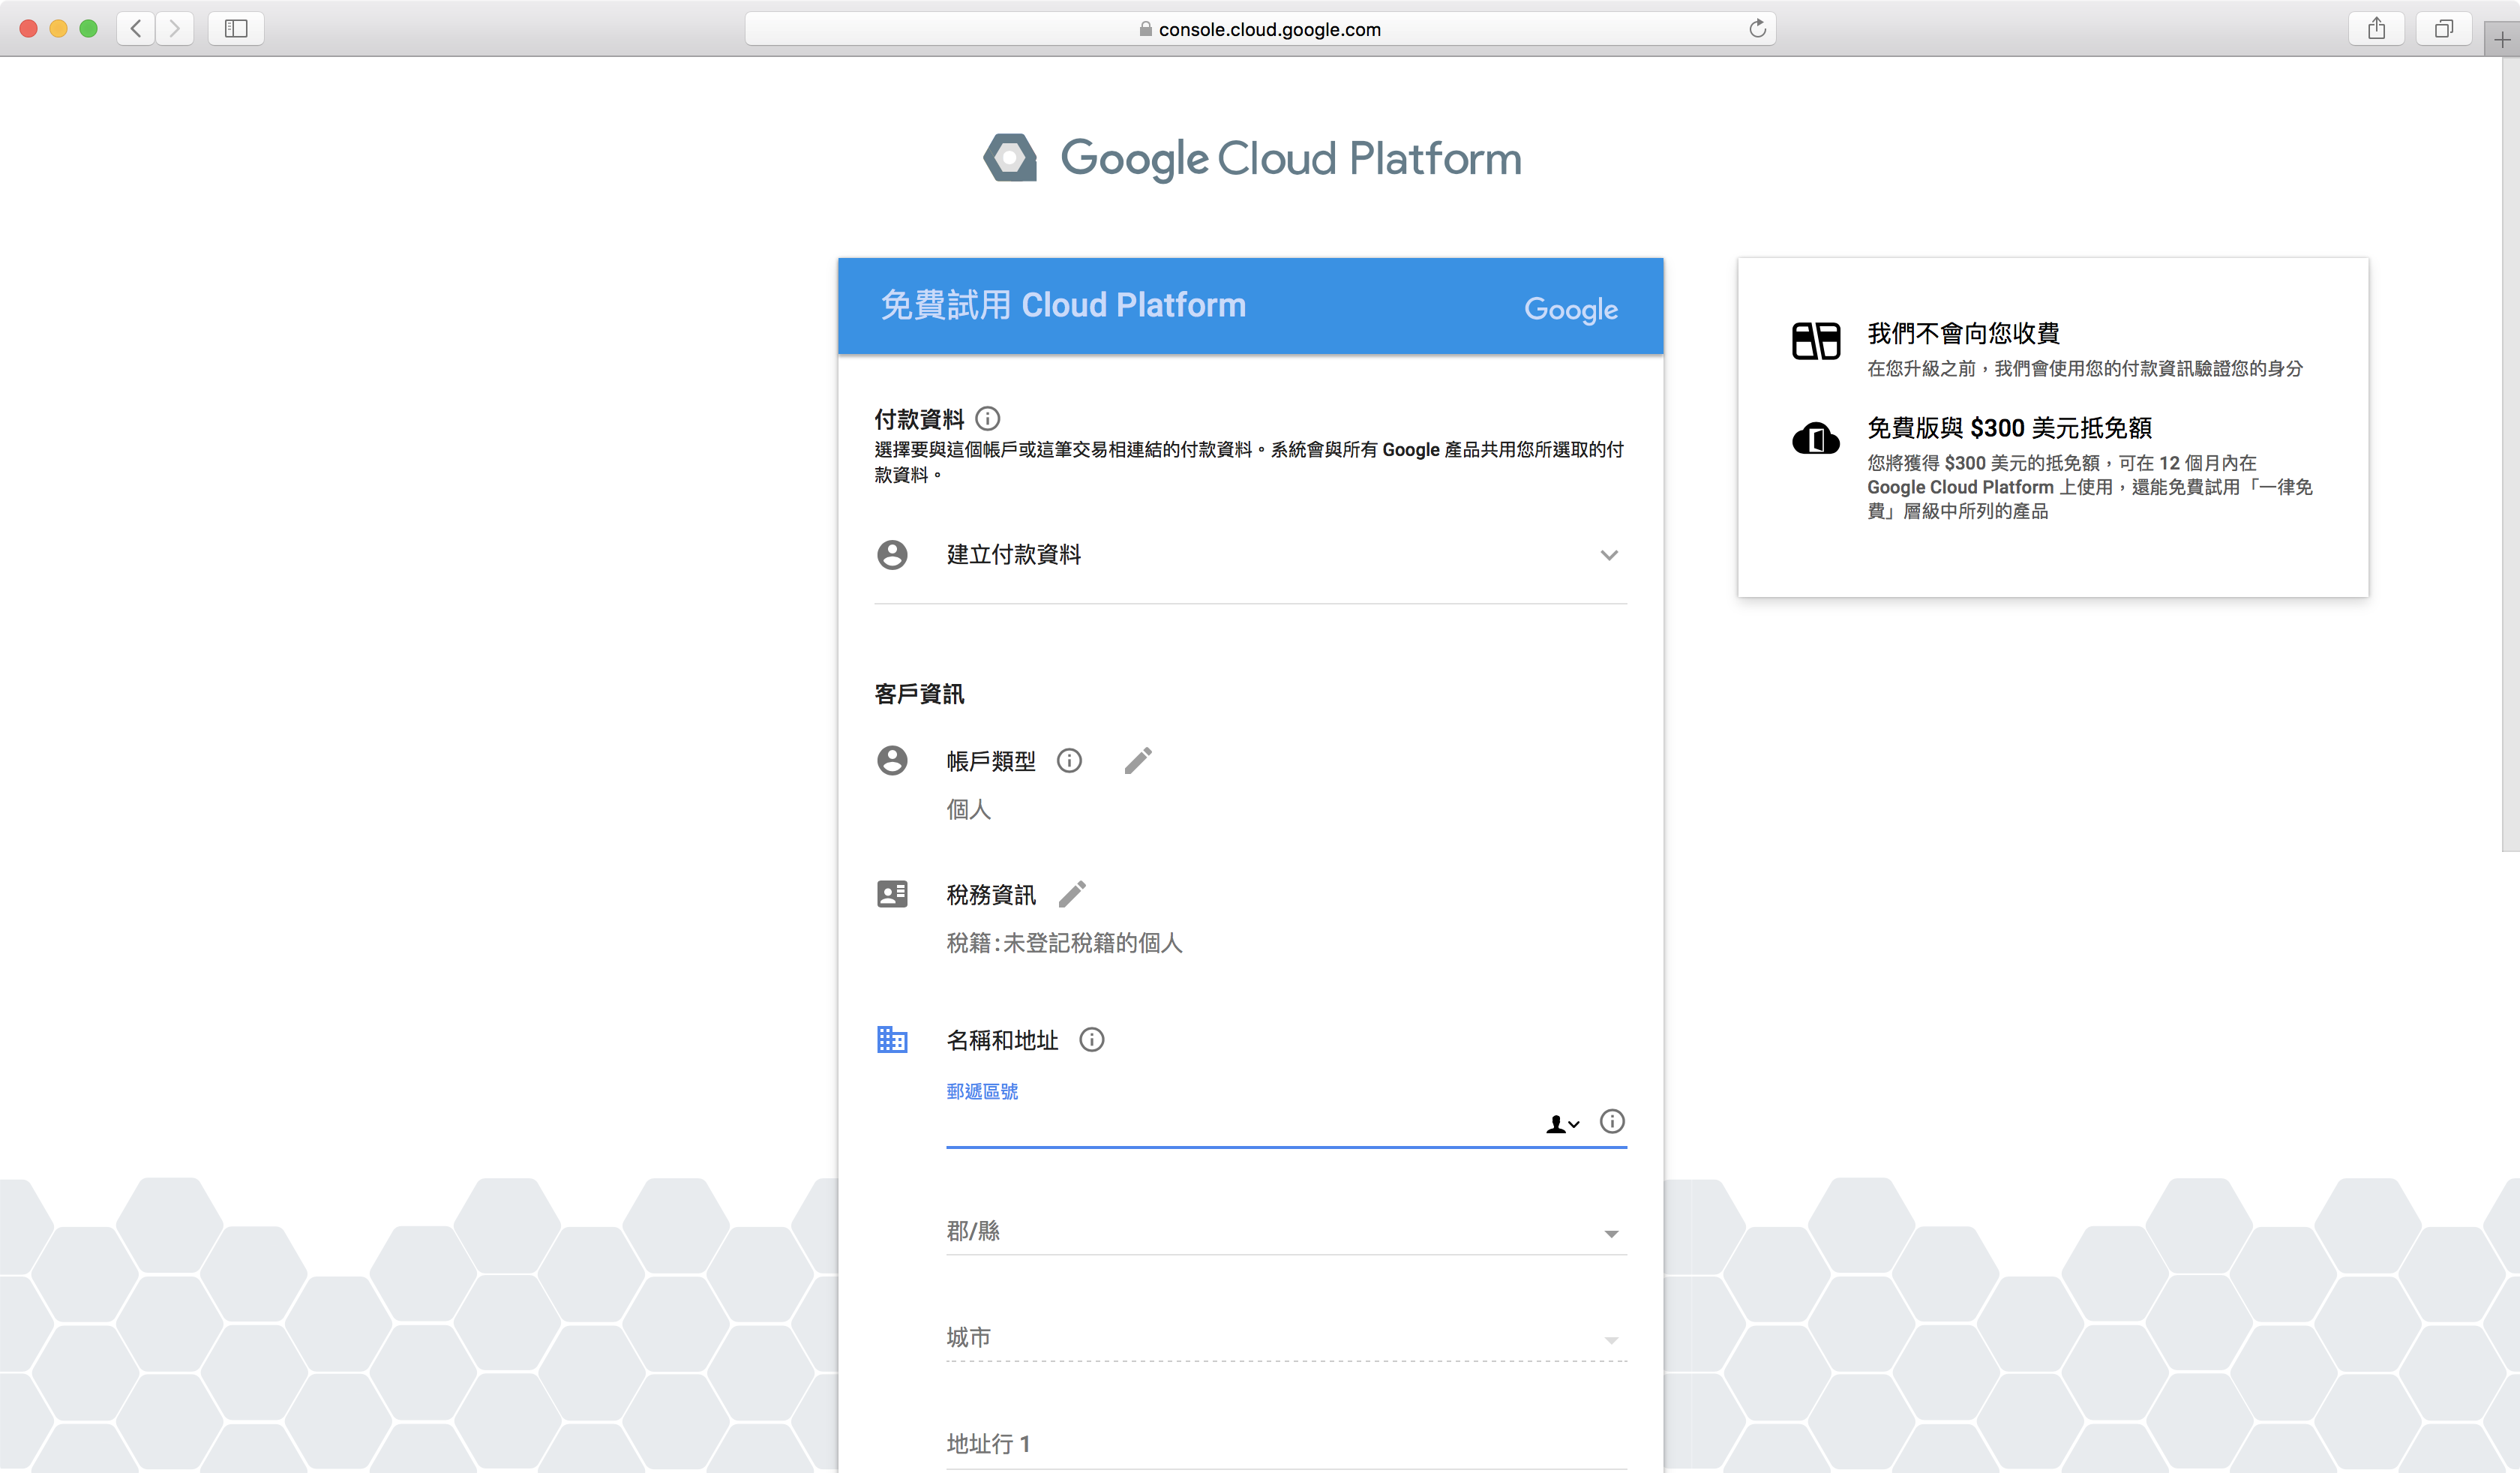 Google Cloud Platform 註冊畫面(二)